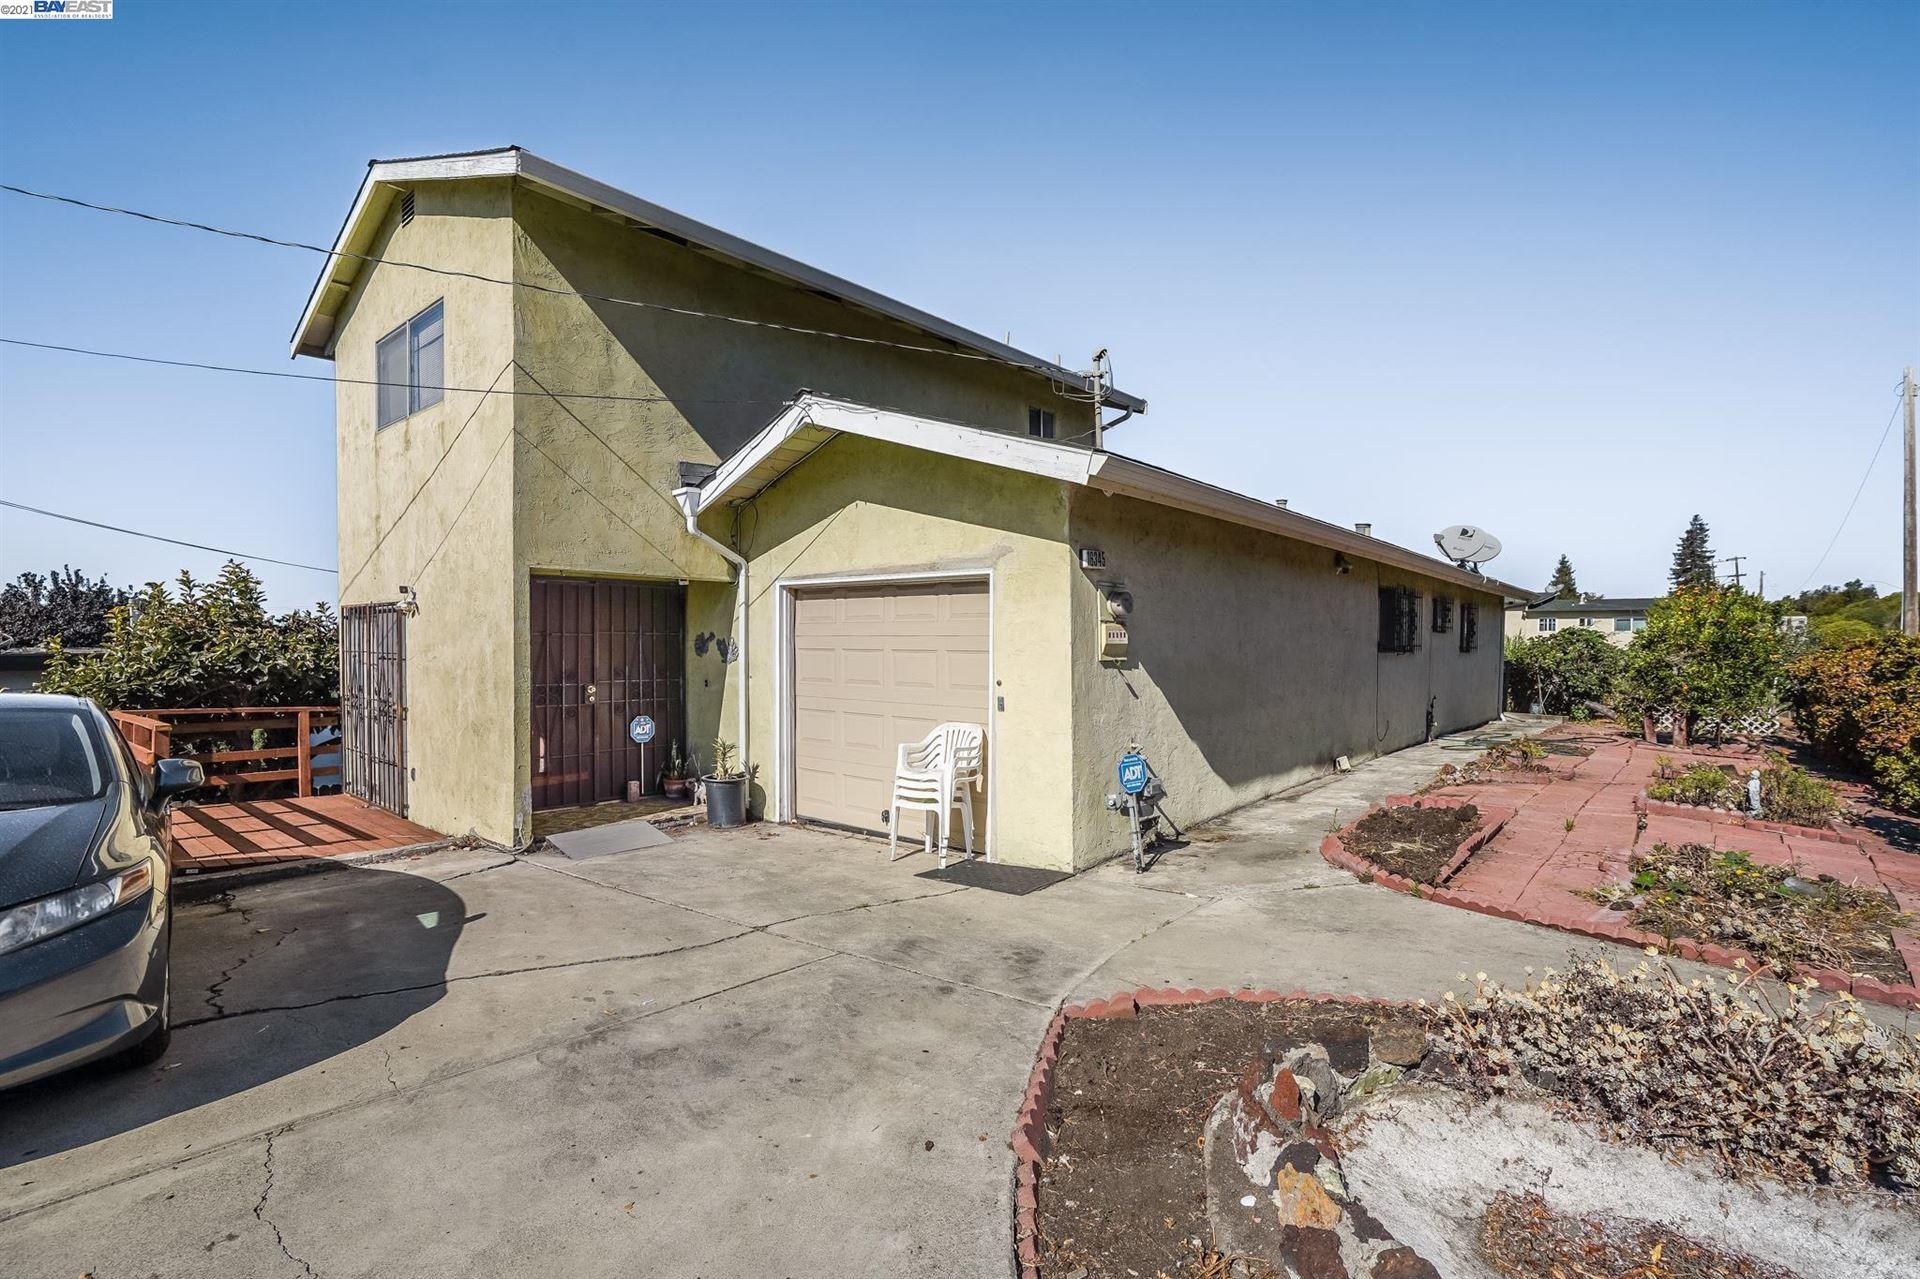 16345 Liberty St, San Leandro, CA 94578 - MLS#: 40968054